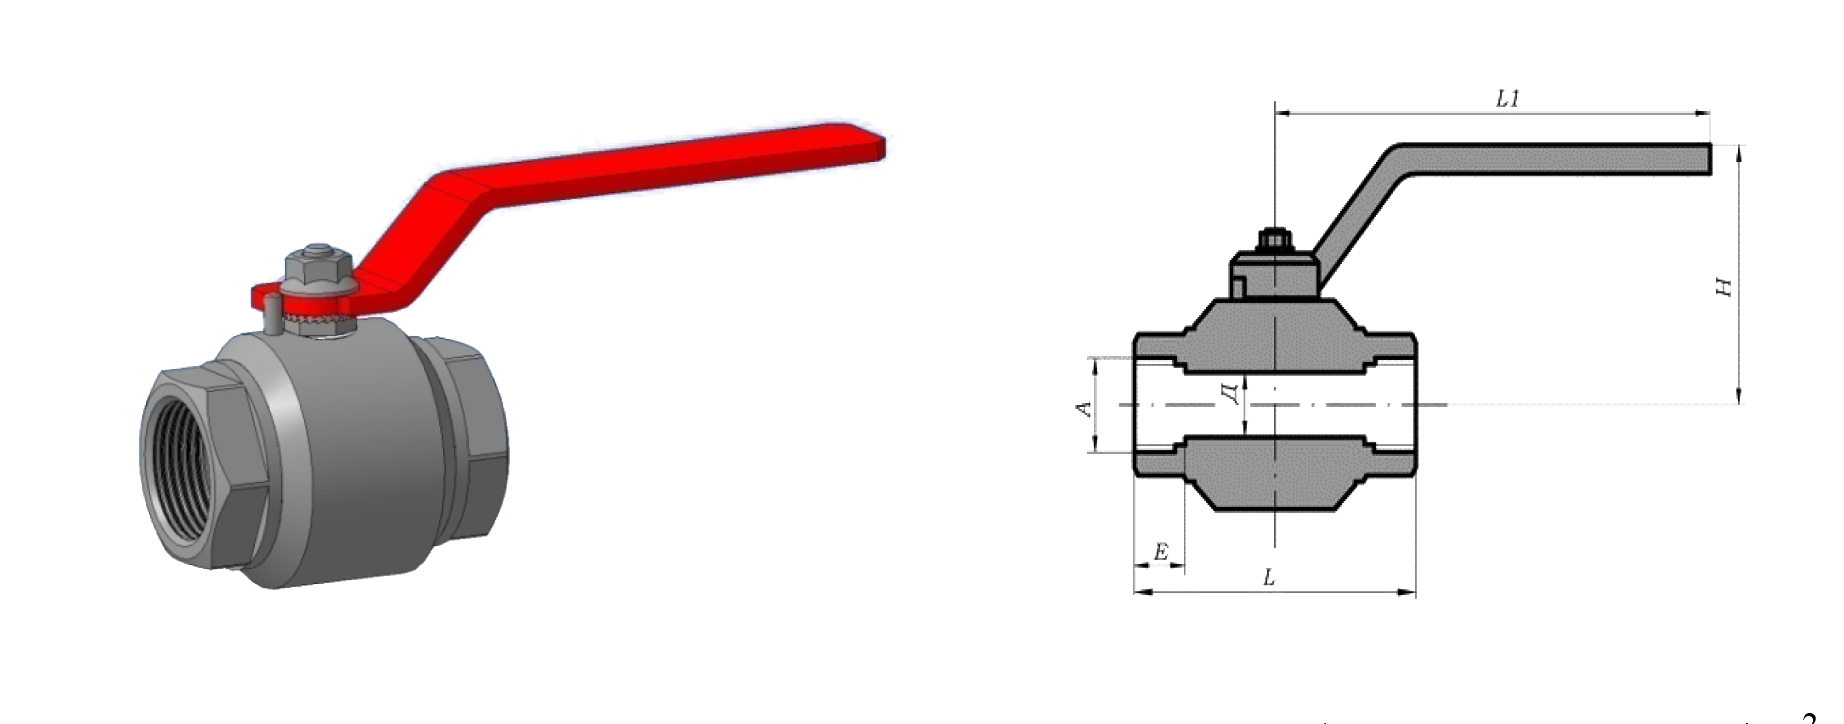 Кран шаровой КШ З АР Д.025-160.10-02Р